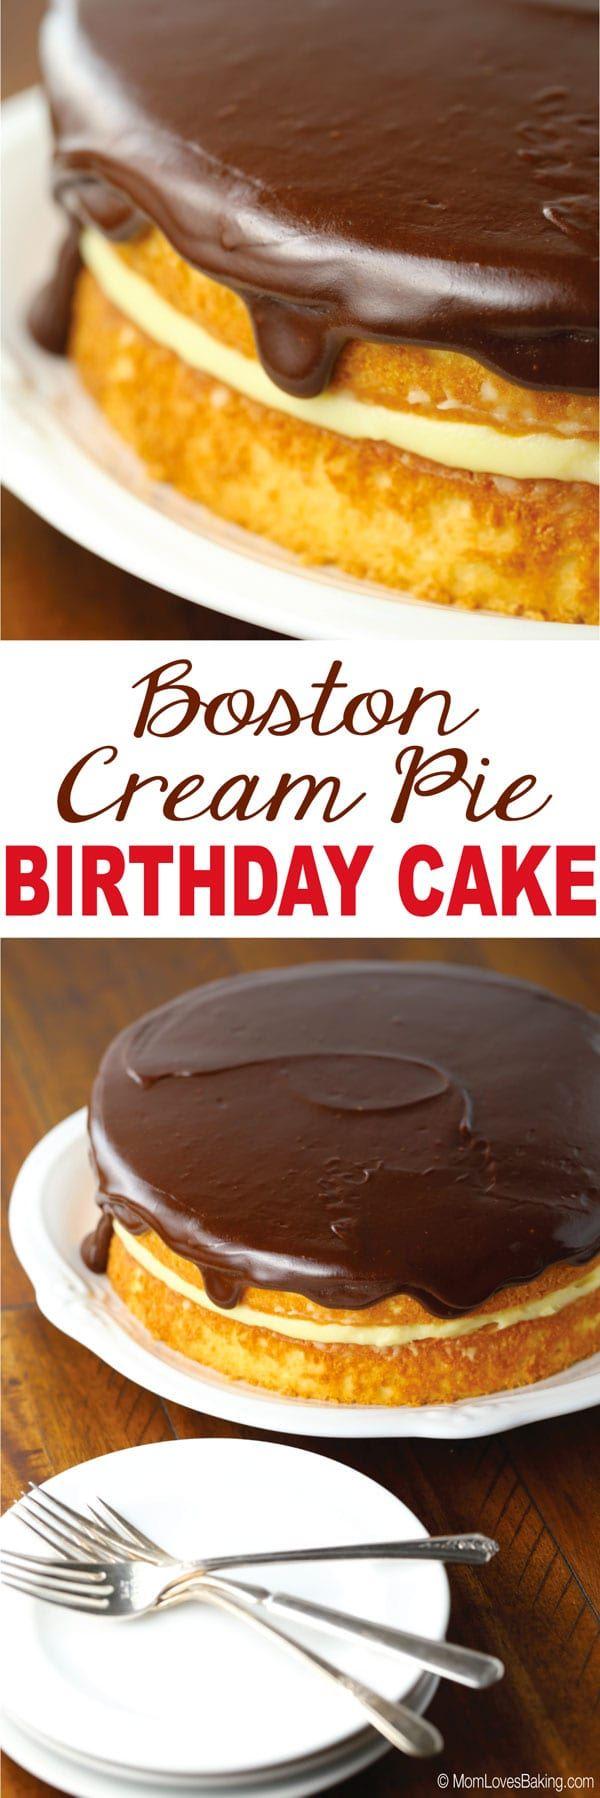 Boston Cream Pie Birthday Cake